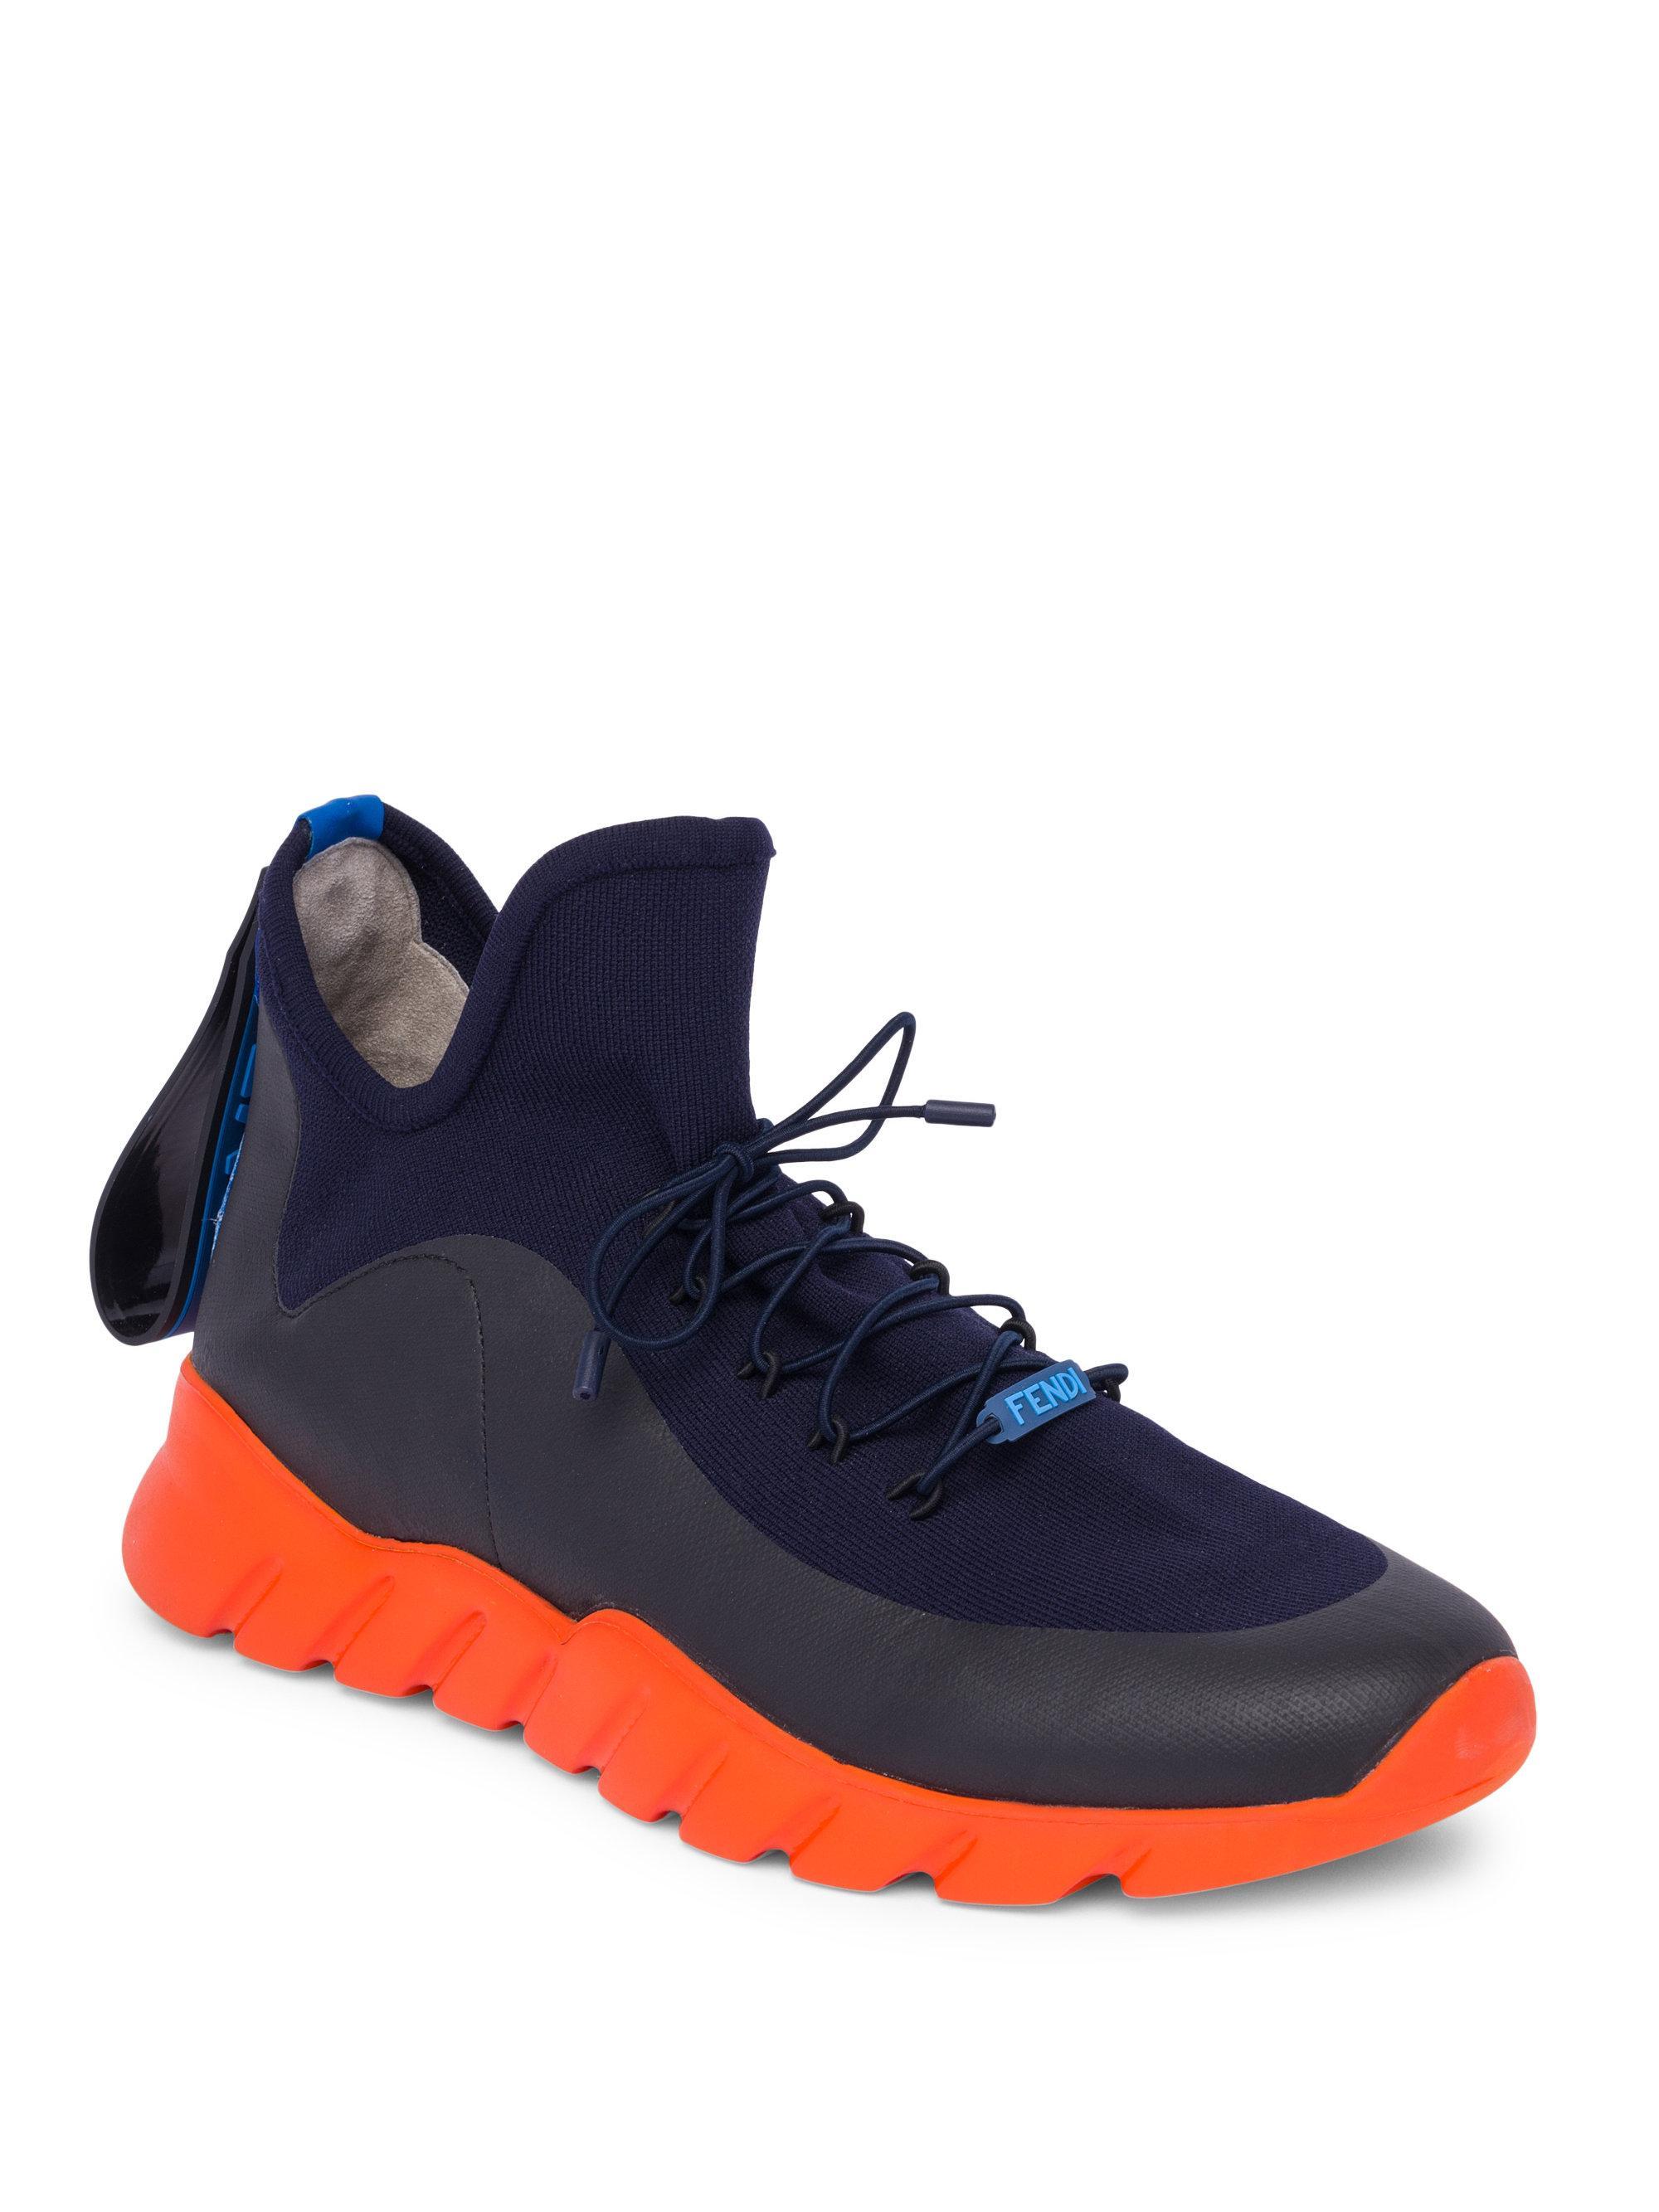 Fendi. Men's Blue Knit Think Colorblock Sneakers